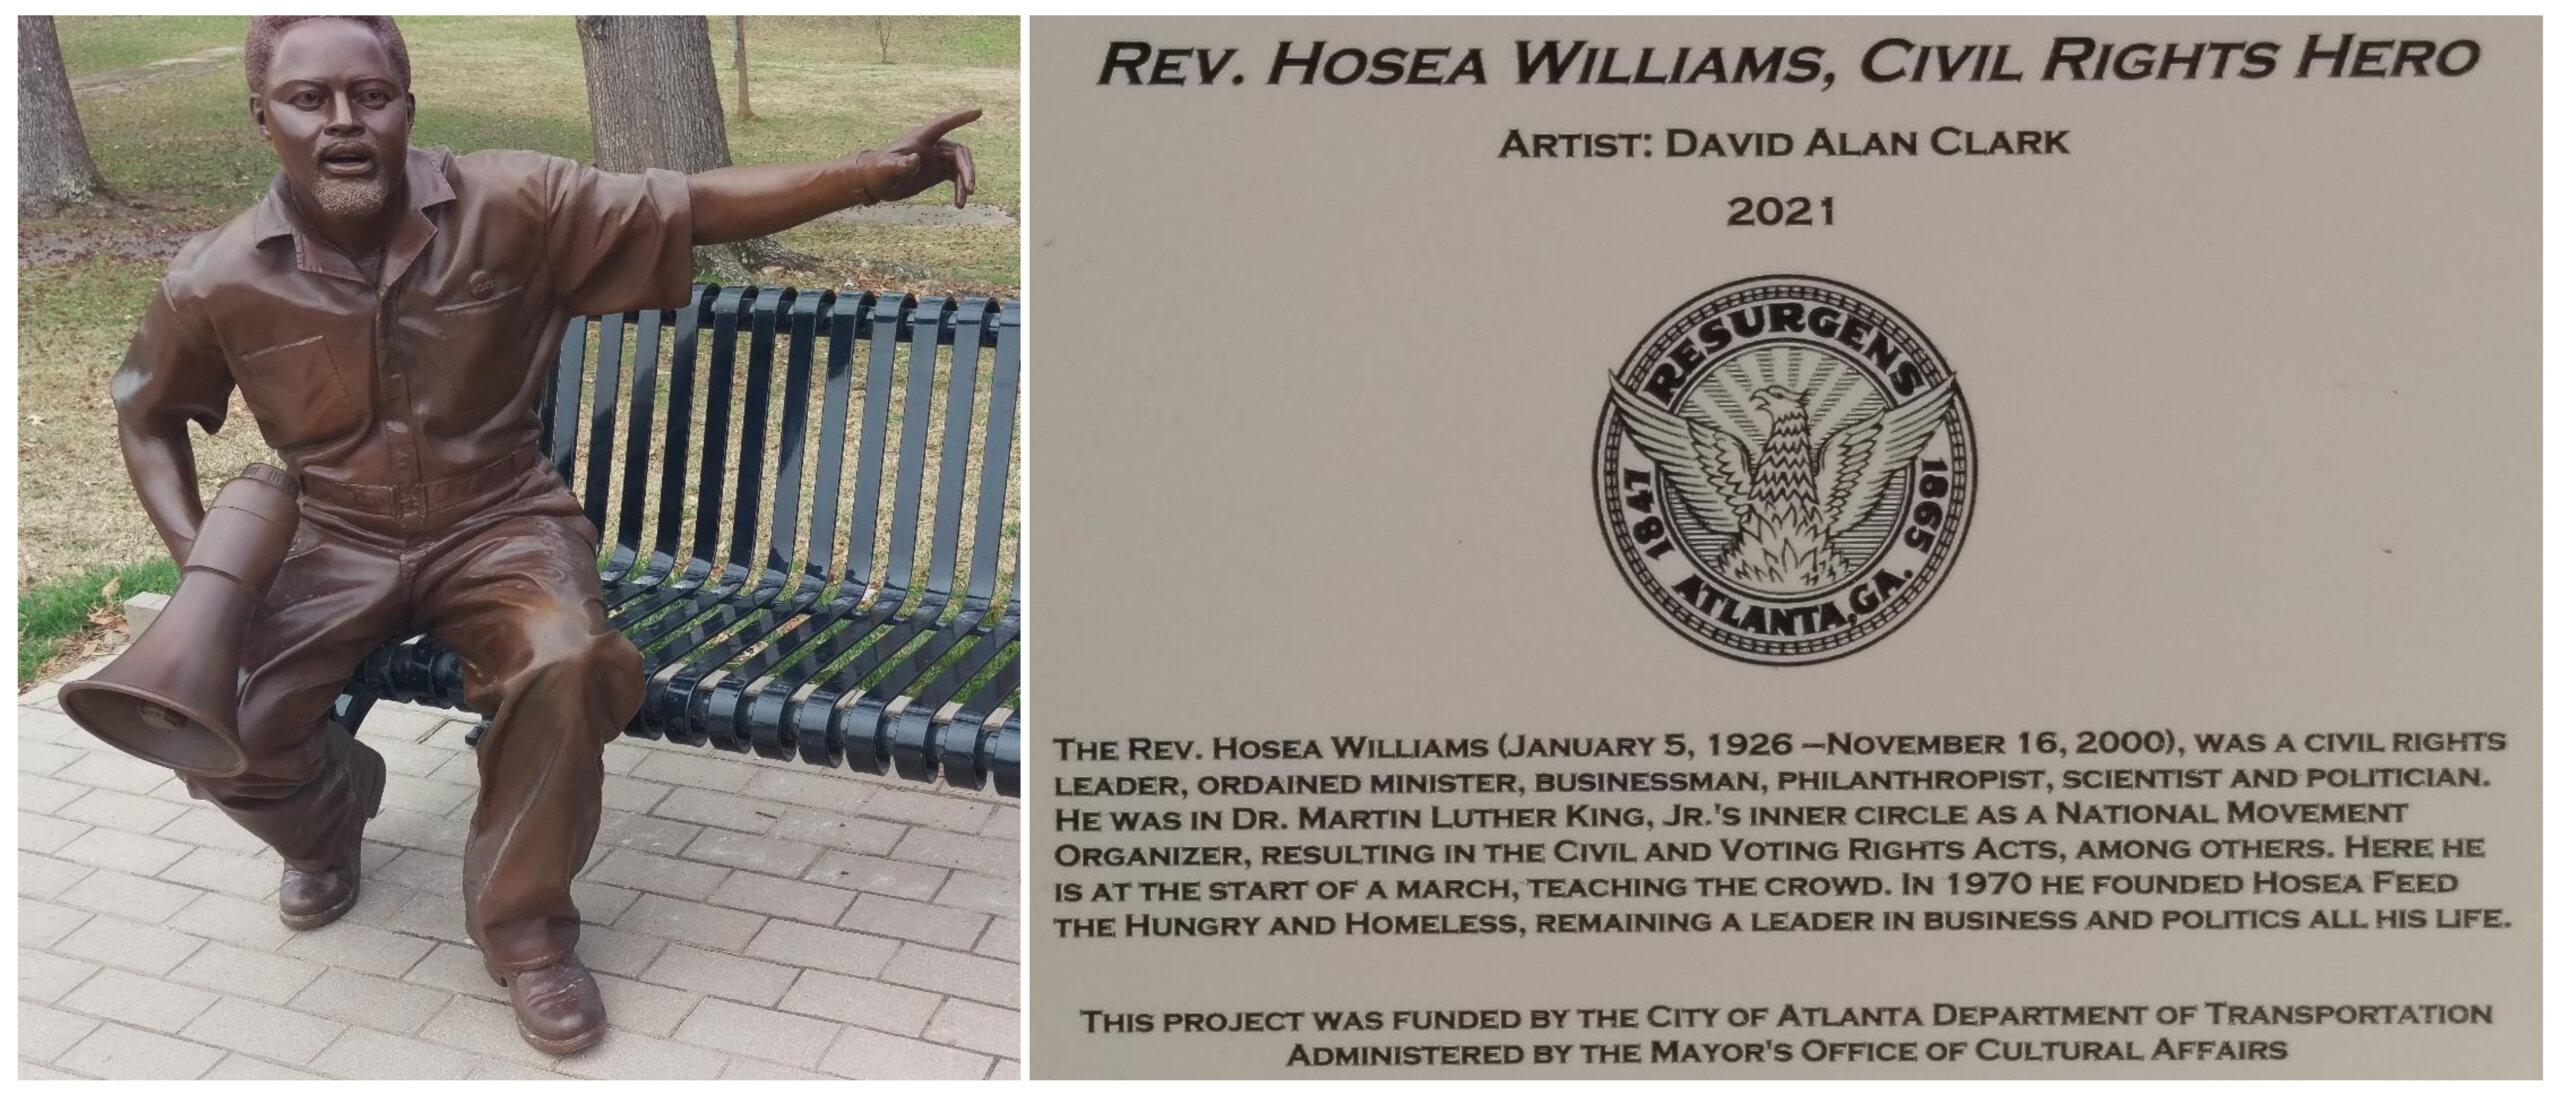 Bronze Art of Reverend Hosea Williams, Photos by John B. Smith, Jr.